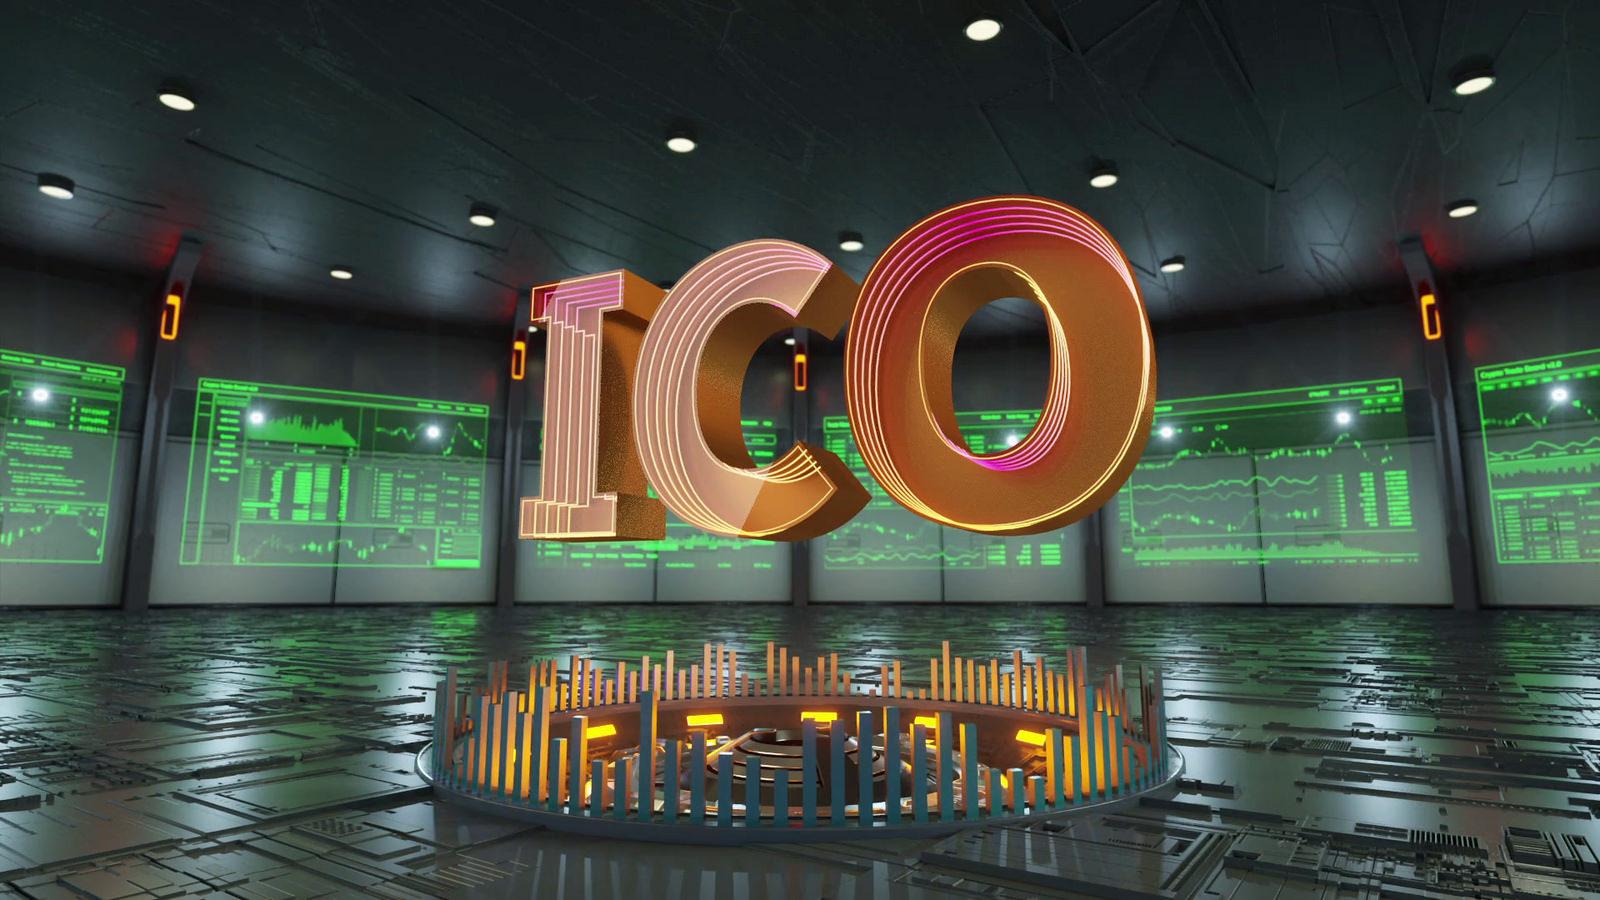 ICO criptográfico